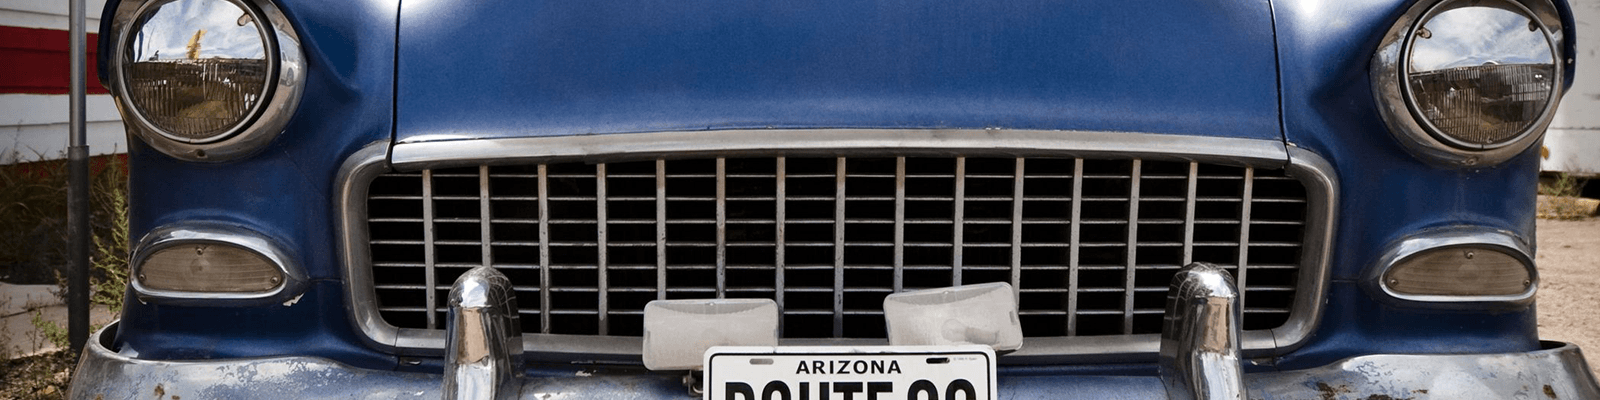 Buying a Car - An American Dream - BHPH